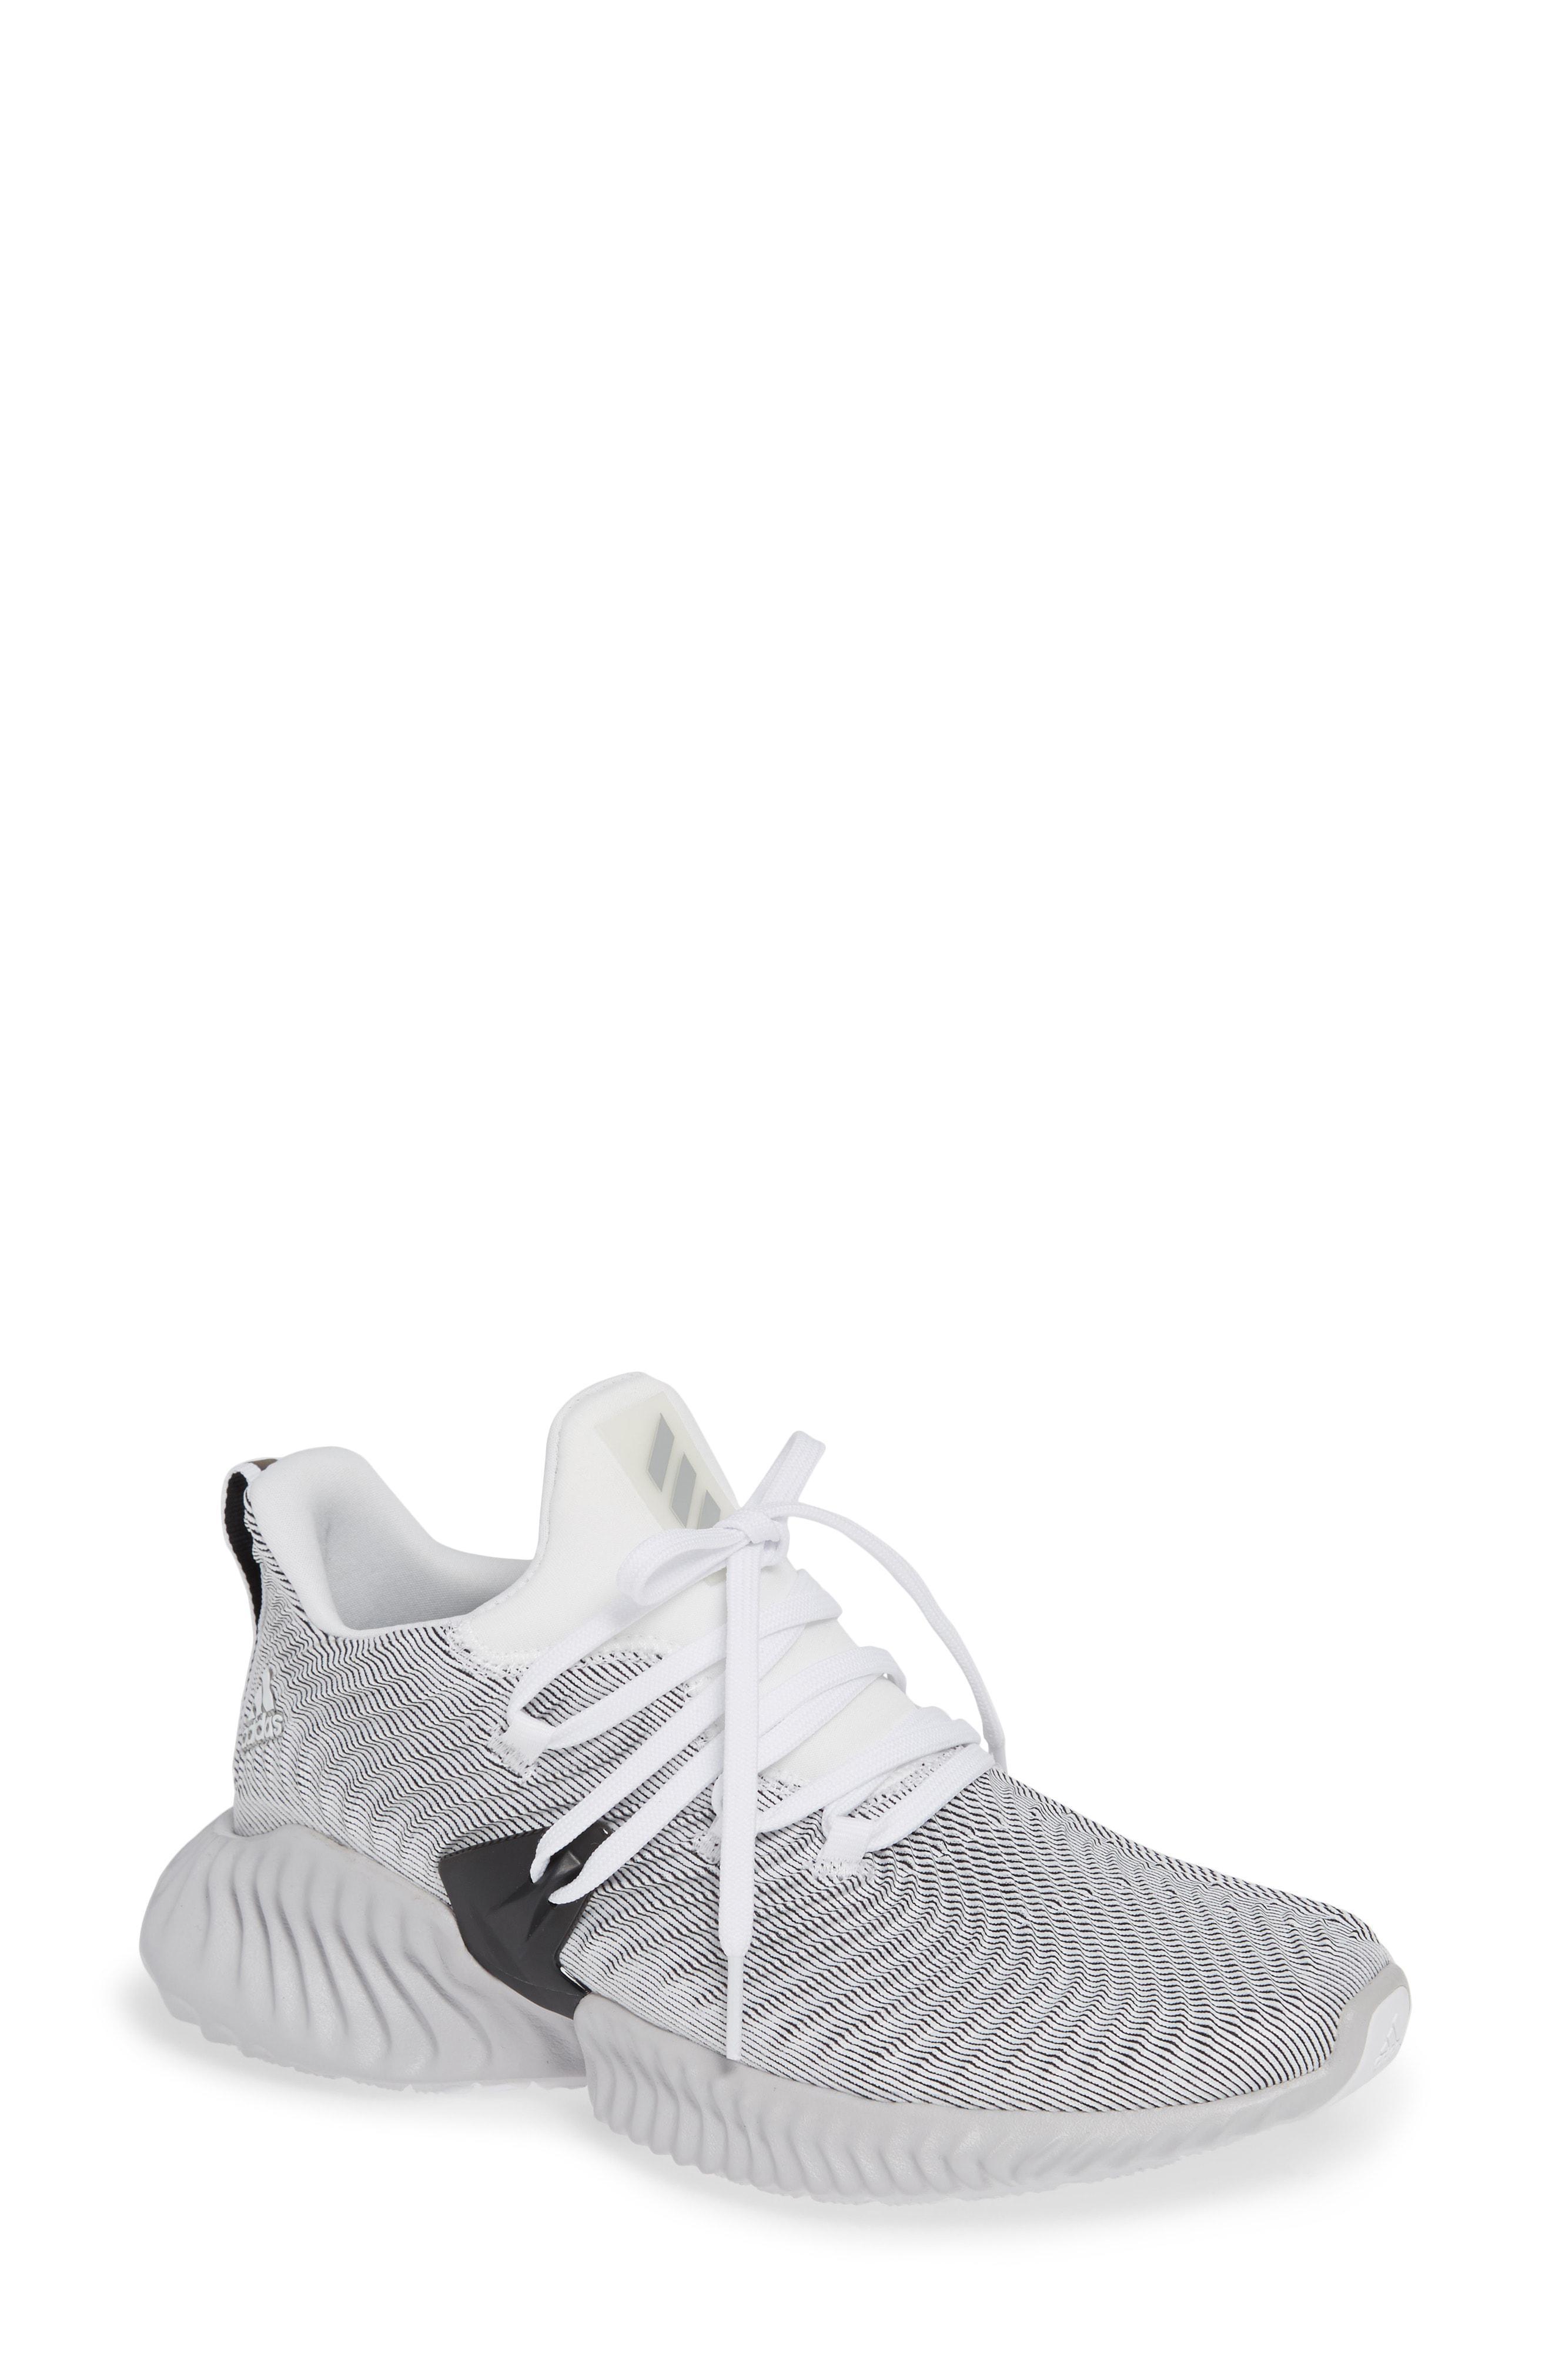 detailed look 425a9 91da6 adidas. Womens White Alphabounce Instinct Sneaker